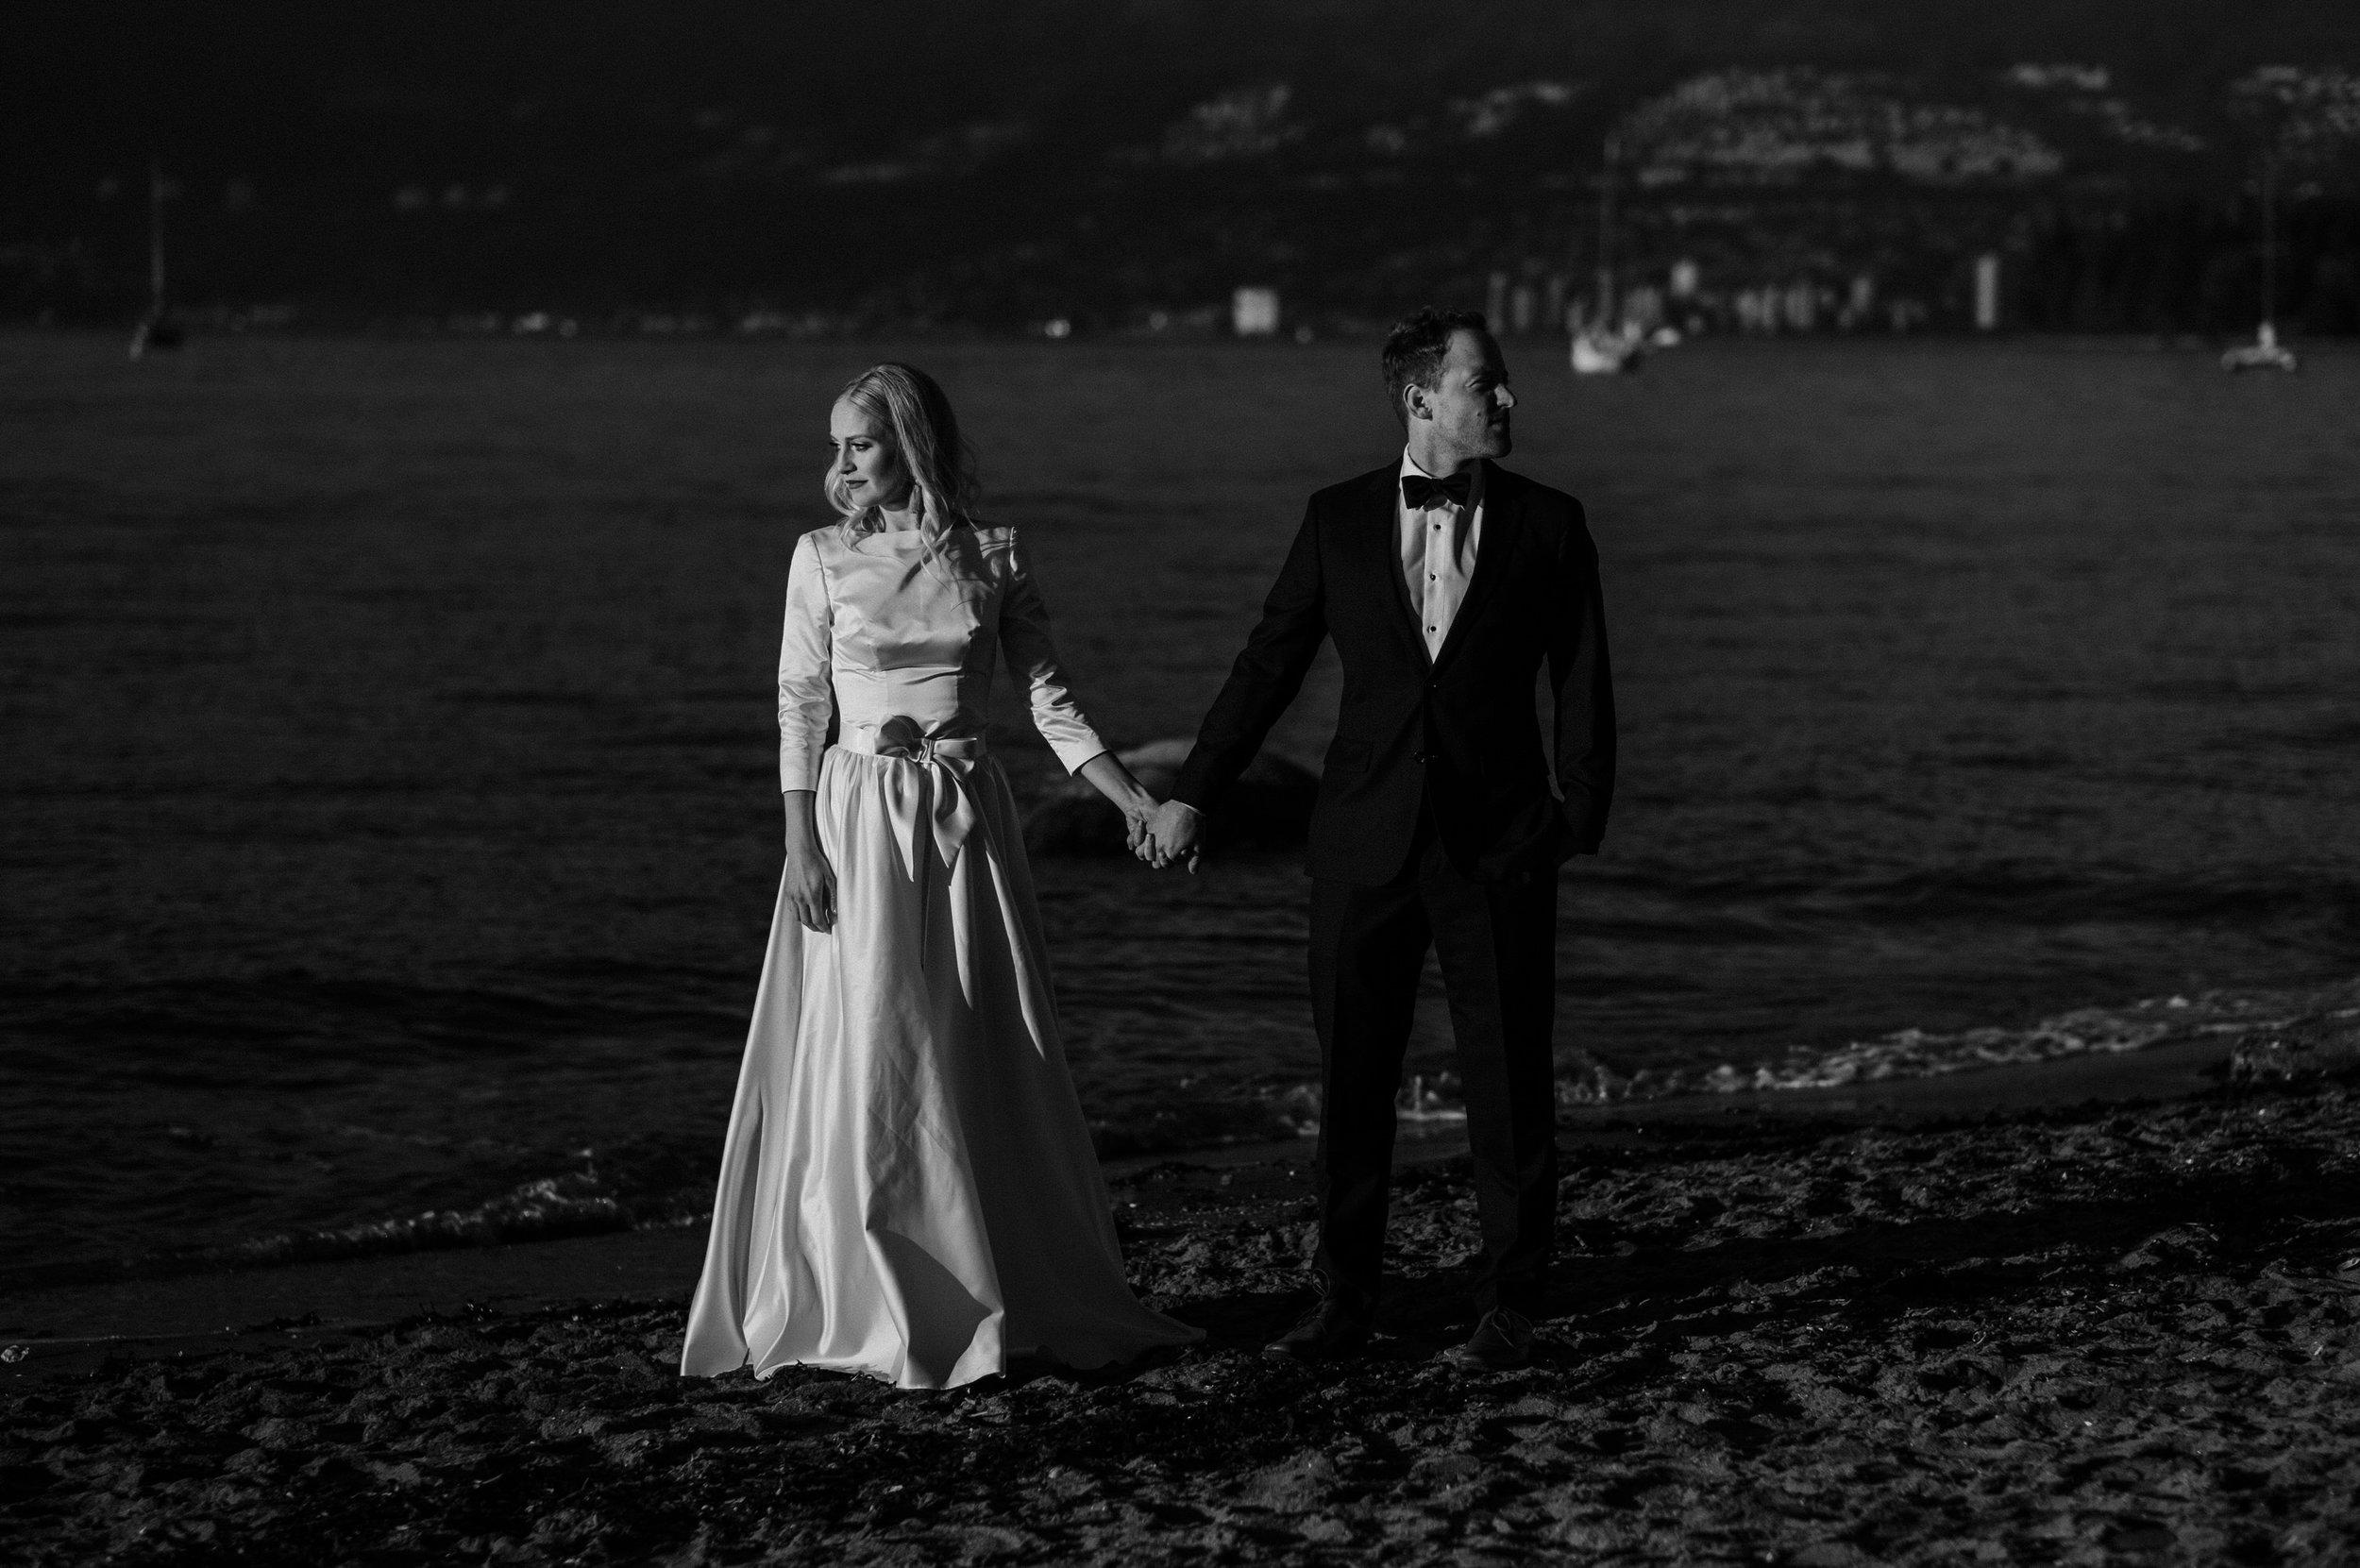 Vancouver Wedding Photos - Vegan Wedding Photographer - New Years Eve Wedding Photos - Vancouver Wedding Photographer - Vancouver Wedding Videographer - 749.JPG